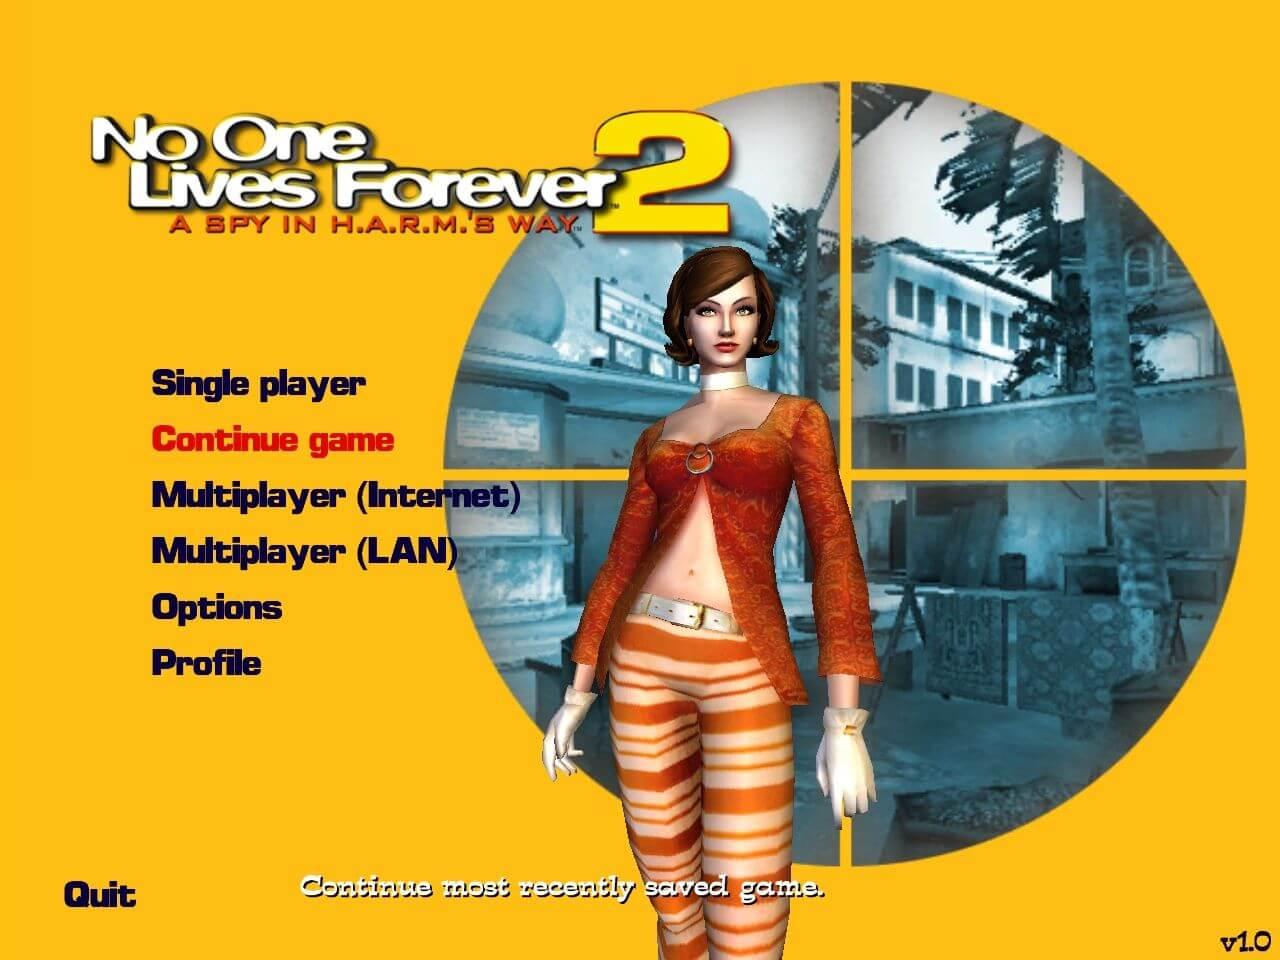 No one lives forever 2 v1. 1 patch image gallery | megagames.